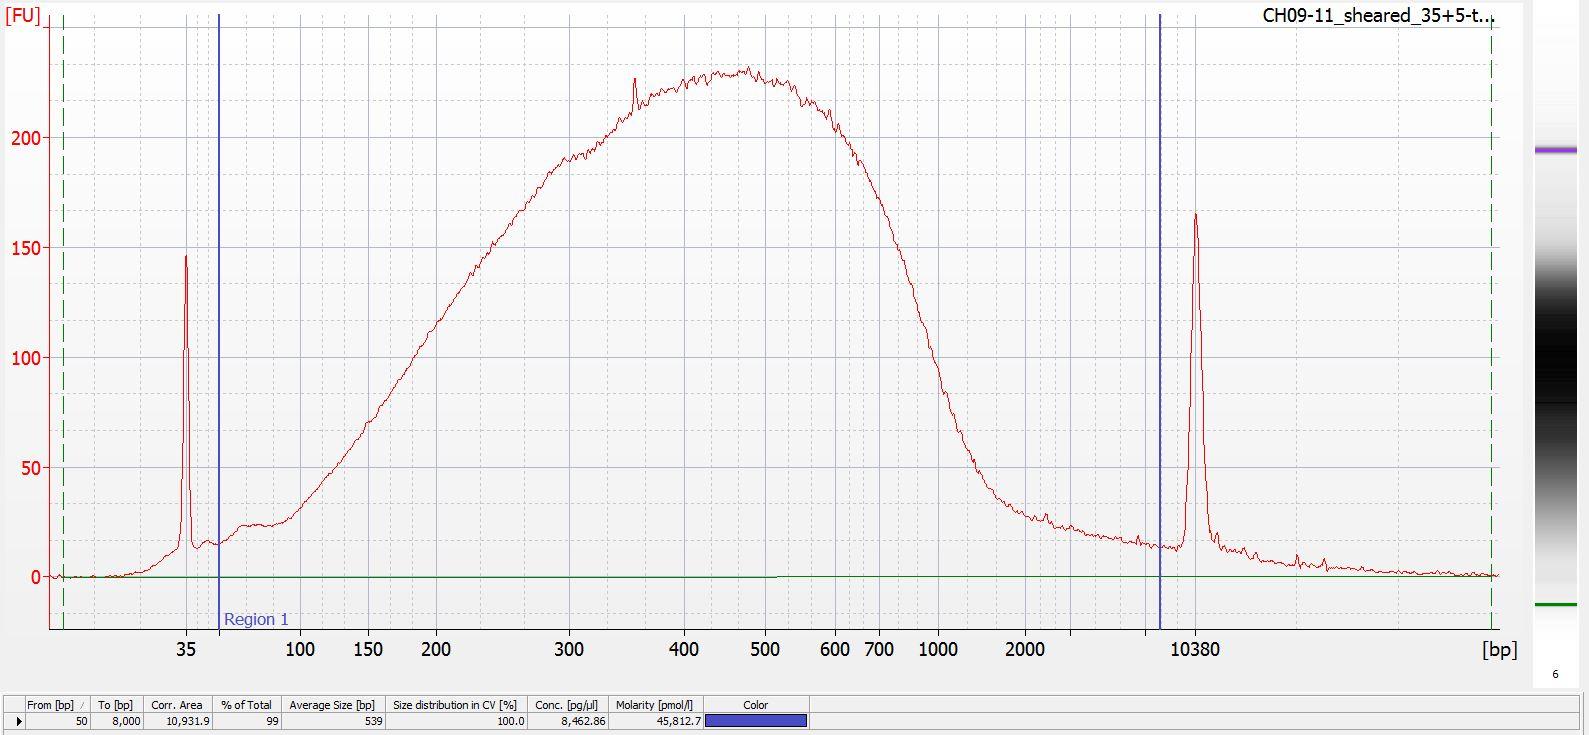 Sheared CH09-11 Bioanalyzer electropherogram